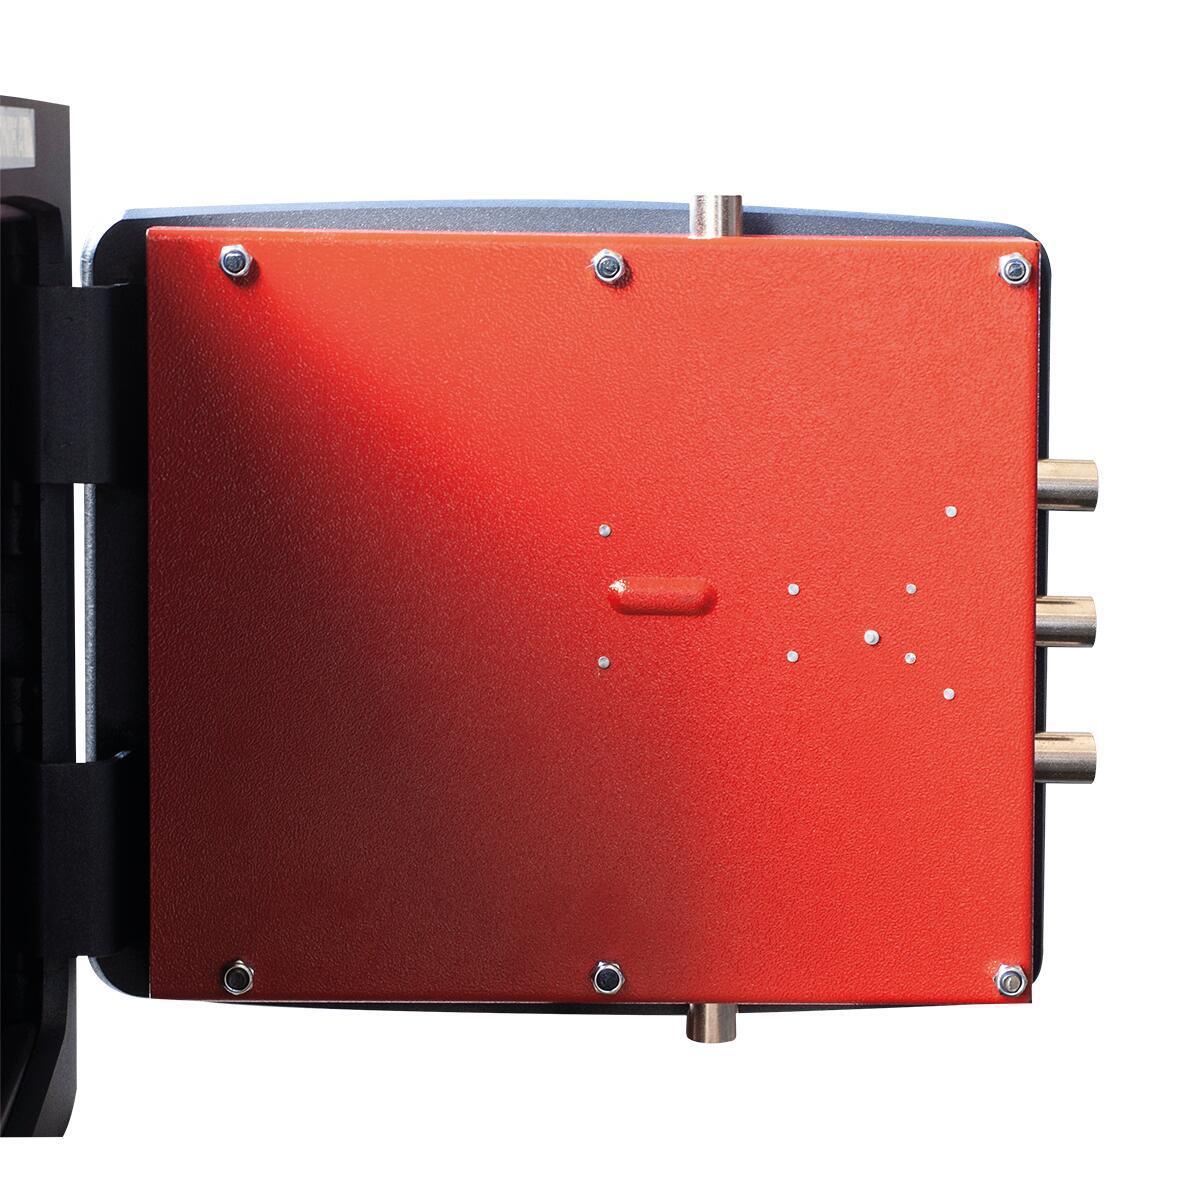 Cassaforte a chiave STARK 1205P da murare L32 x P24 x H49 cm - 5